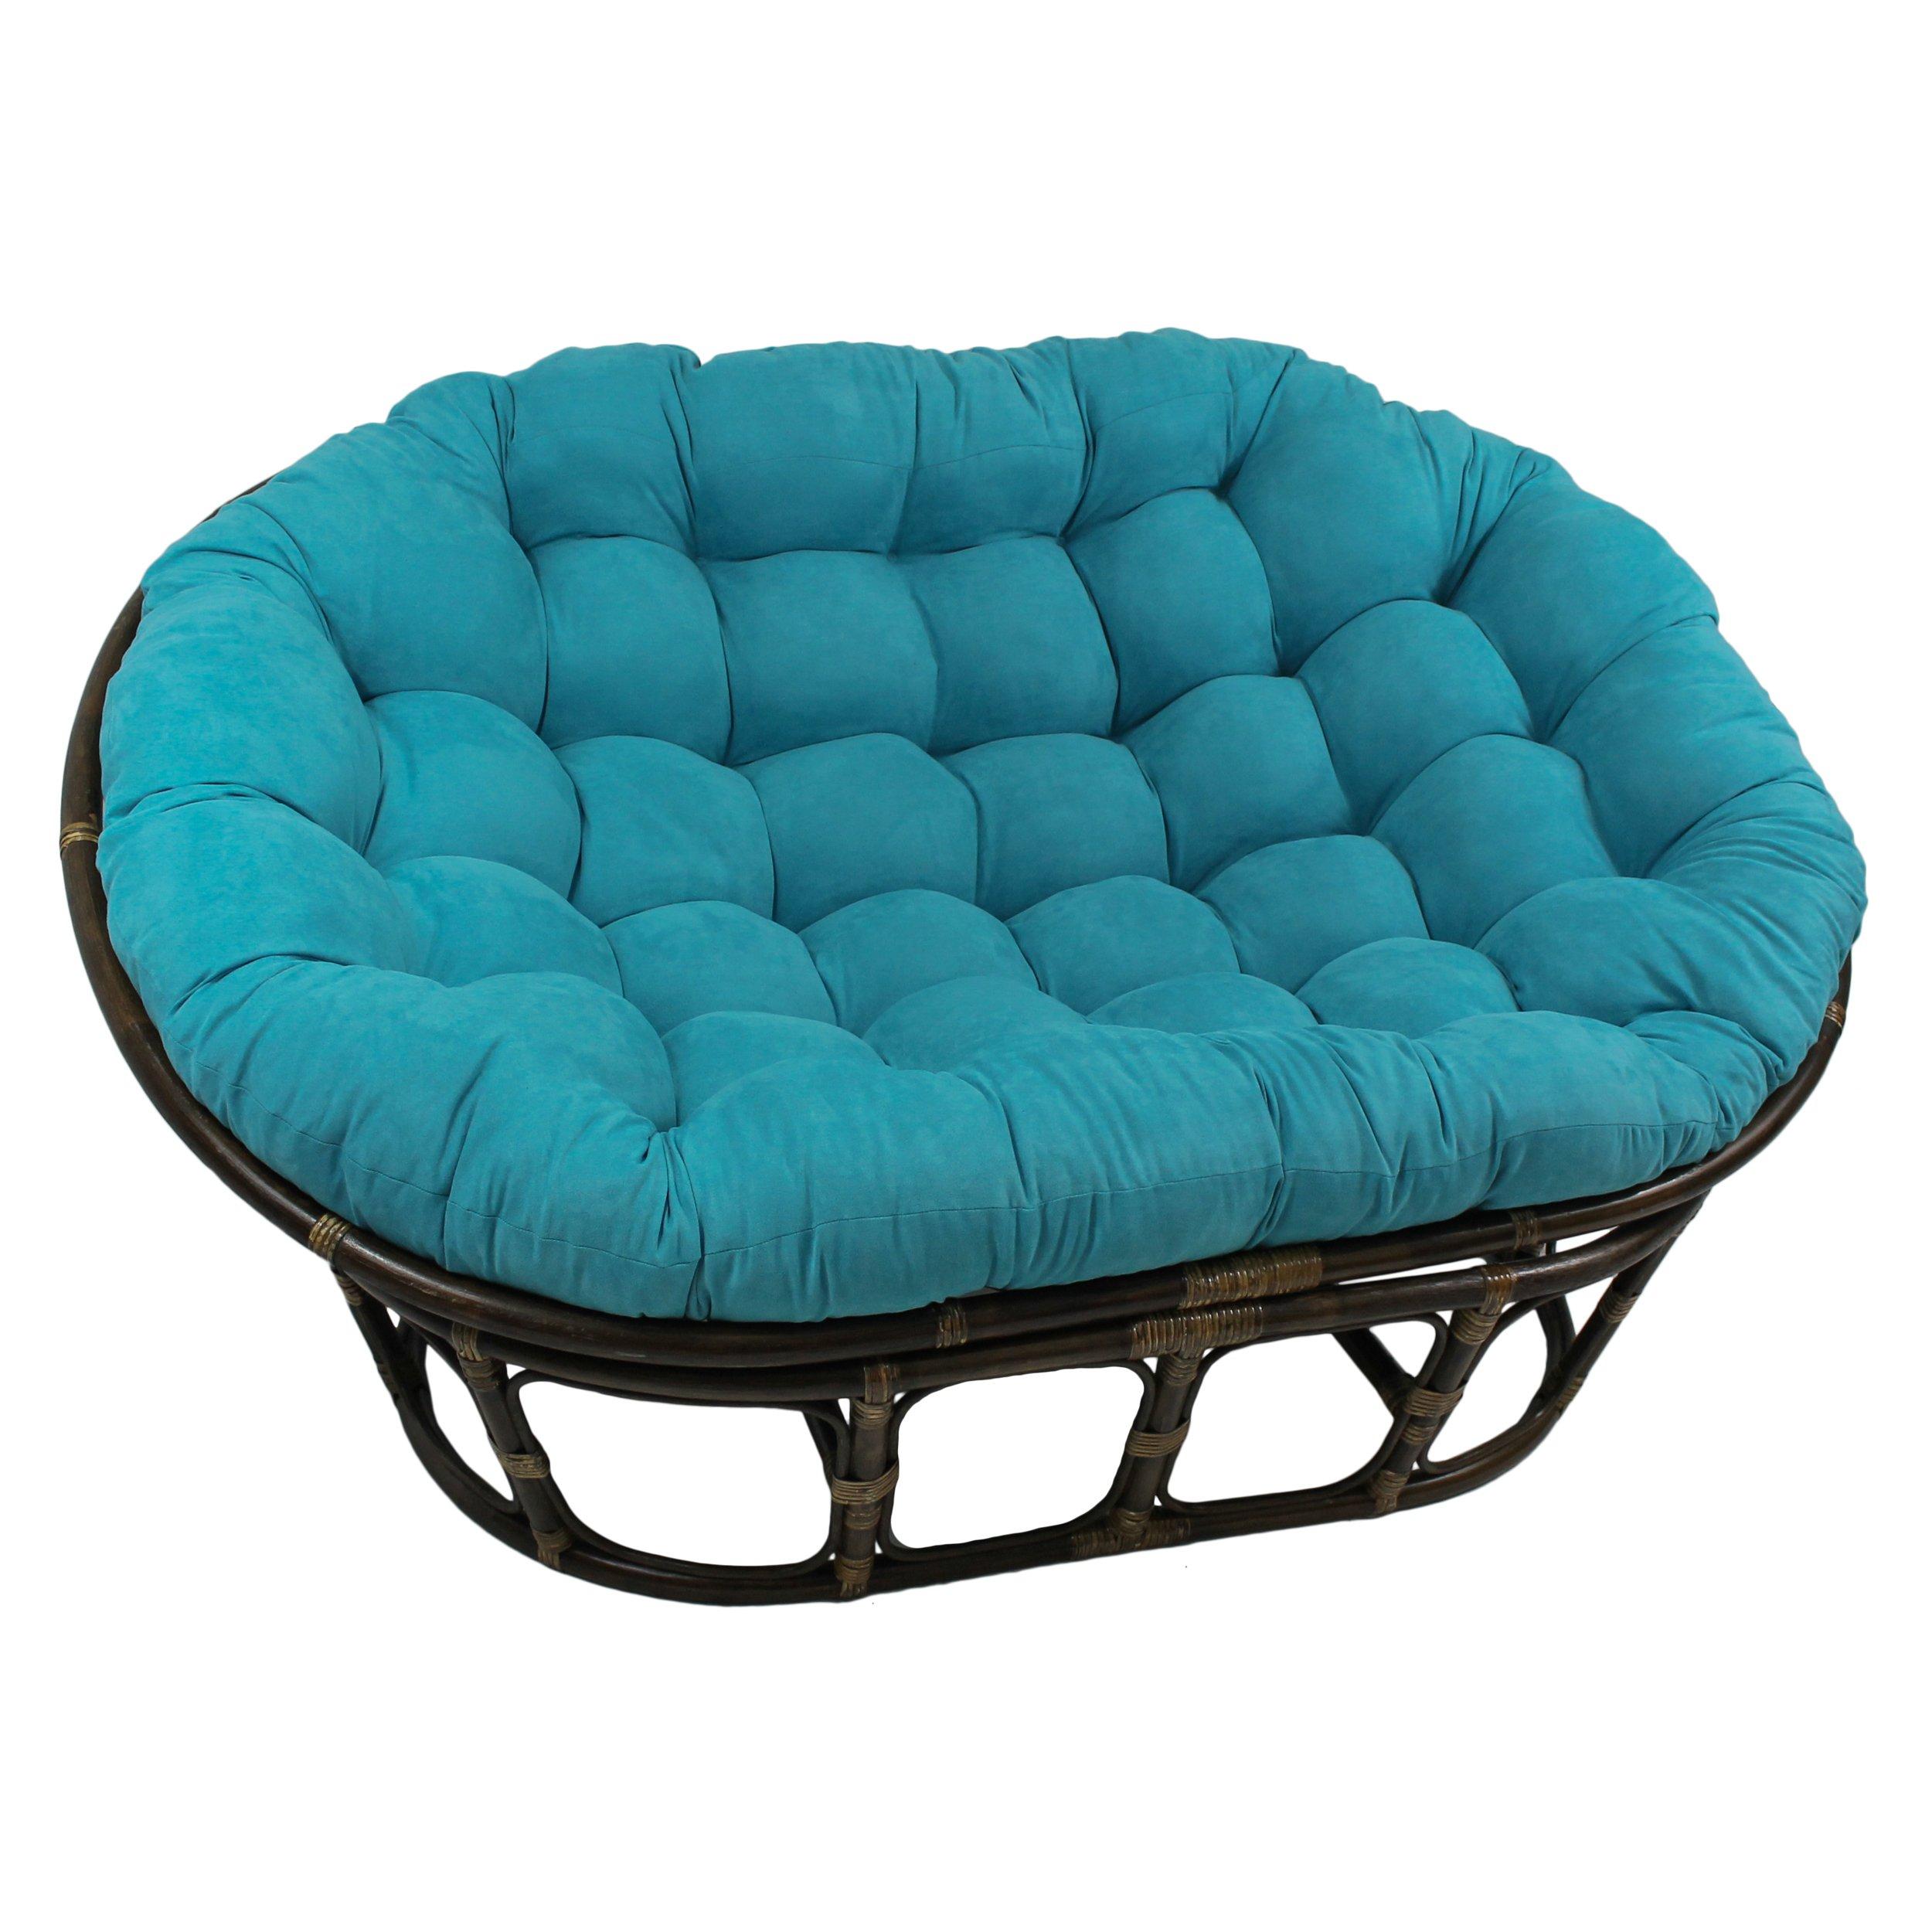 Blazing Needles Solid Microsuede Double Papasan Chair Cushion, 58'' x 6'' x 78'', Java